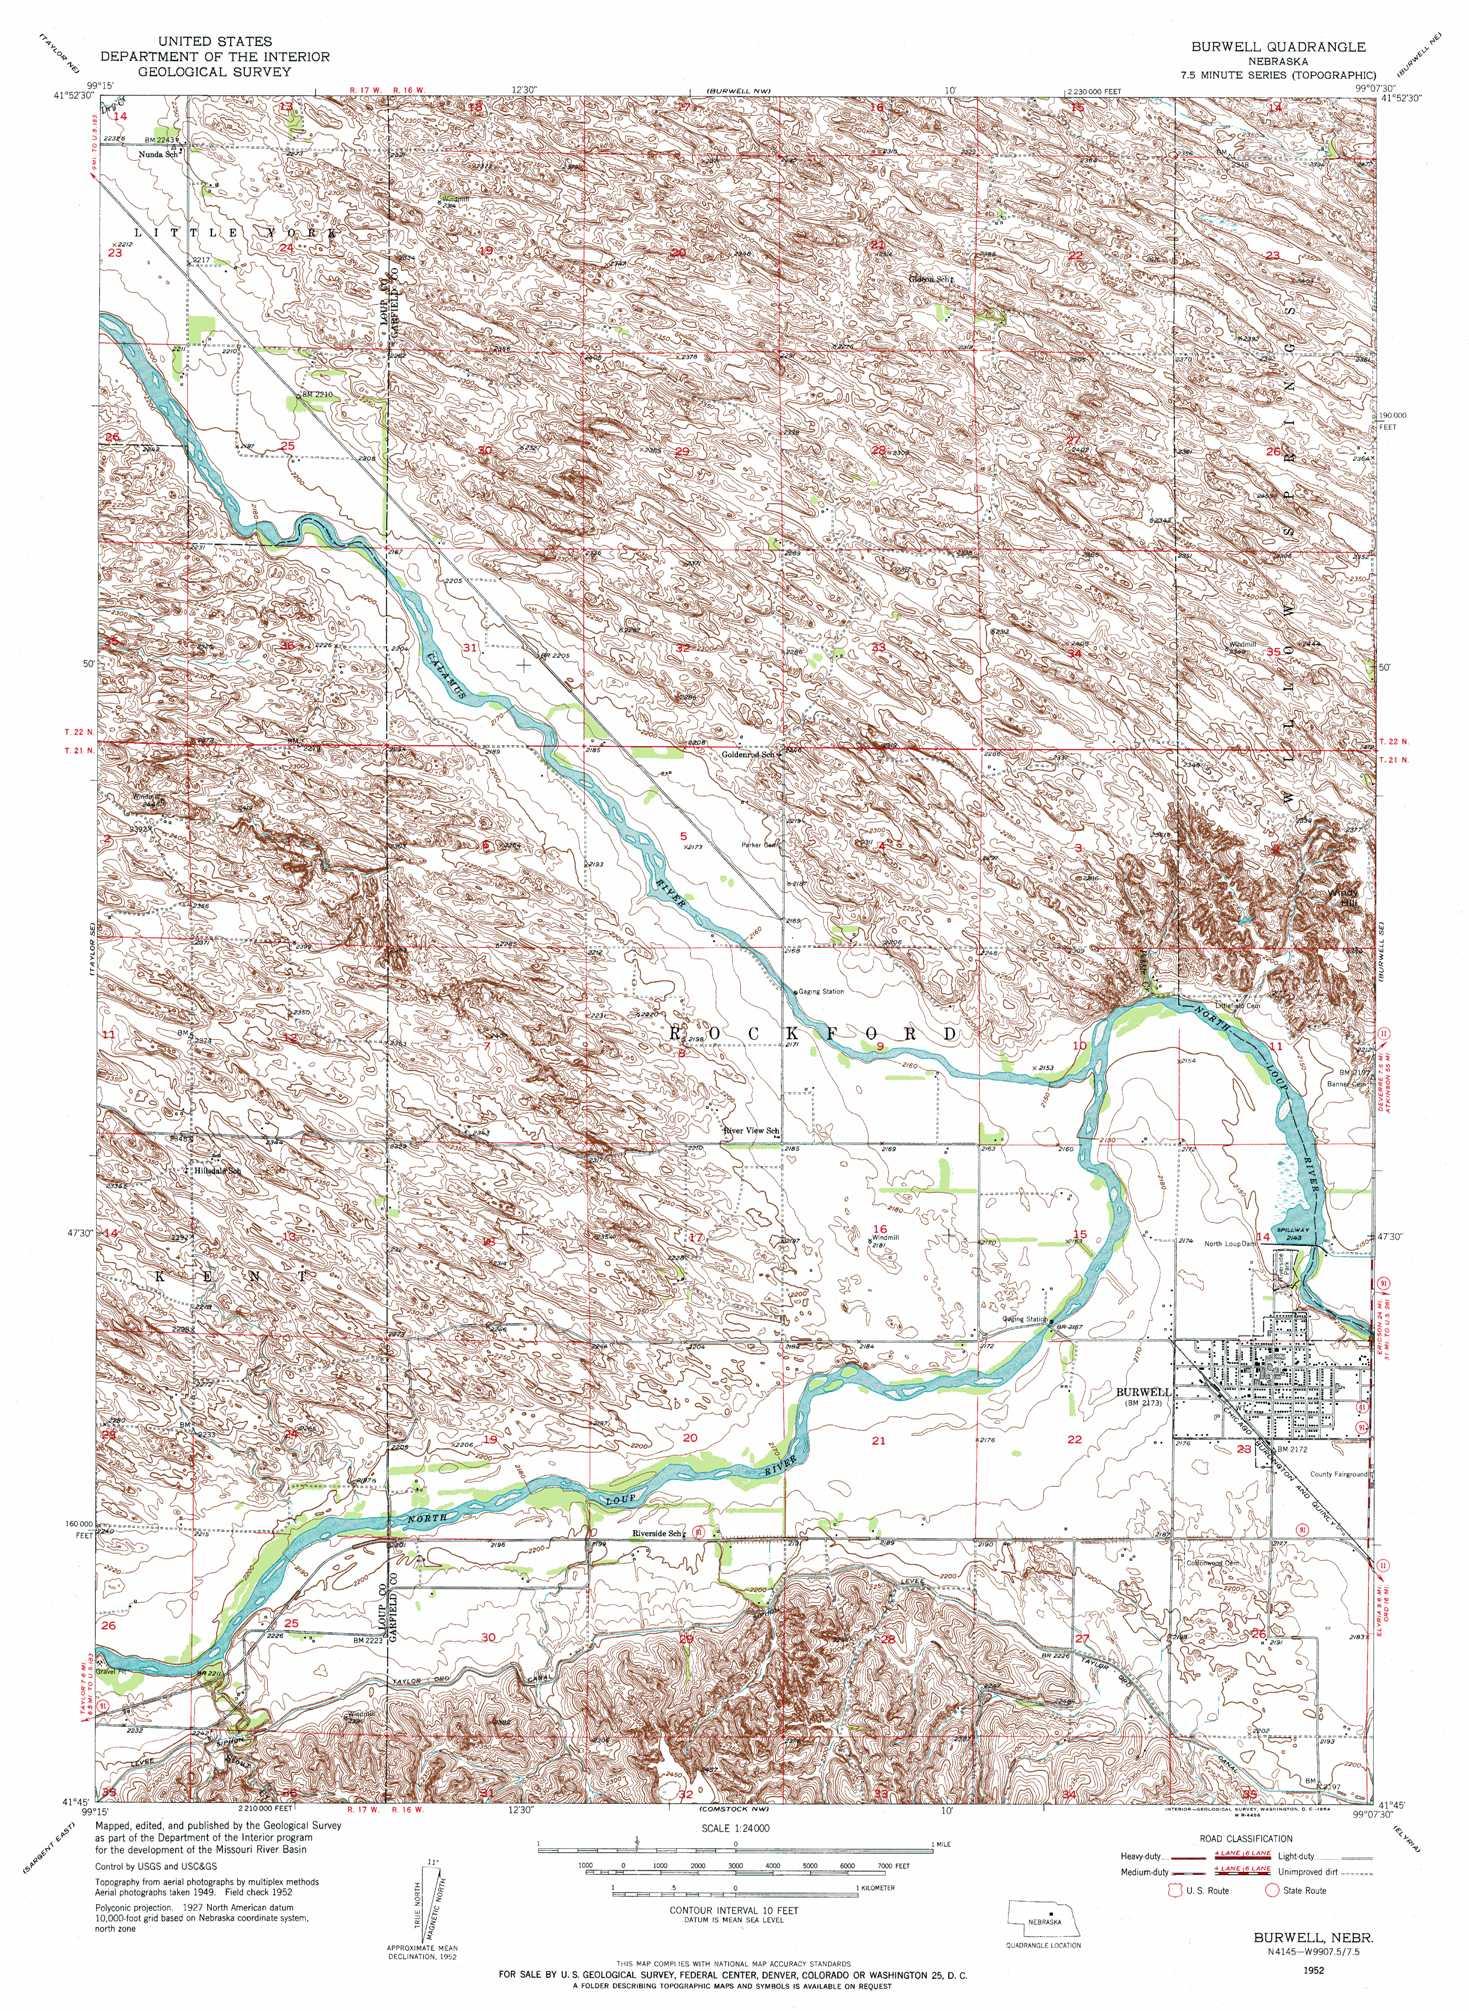 Burwell Nebraska Map.Burwell Topographic Map Ne Usgs Topo Quad 41099g2